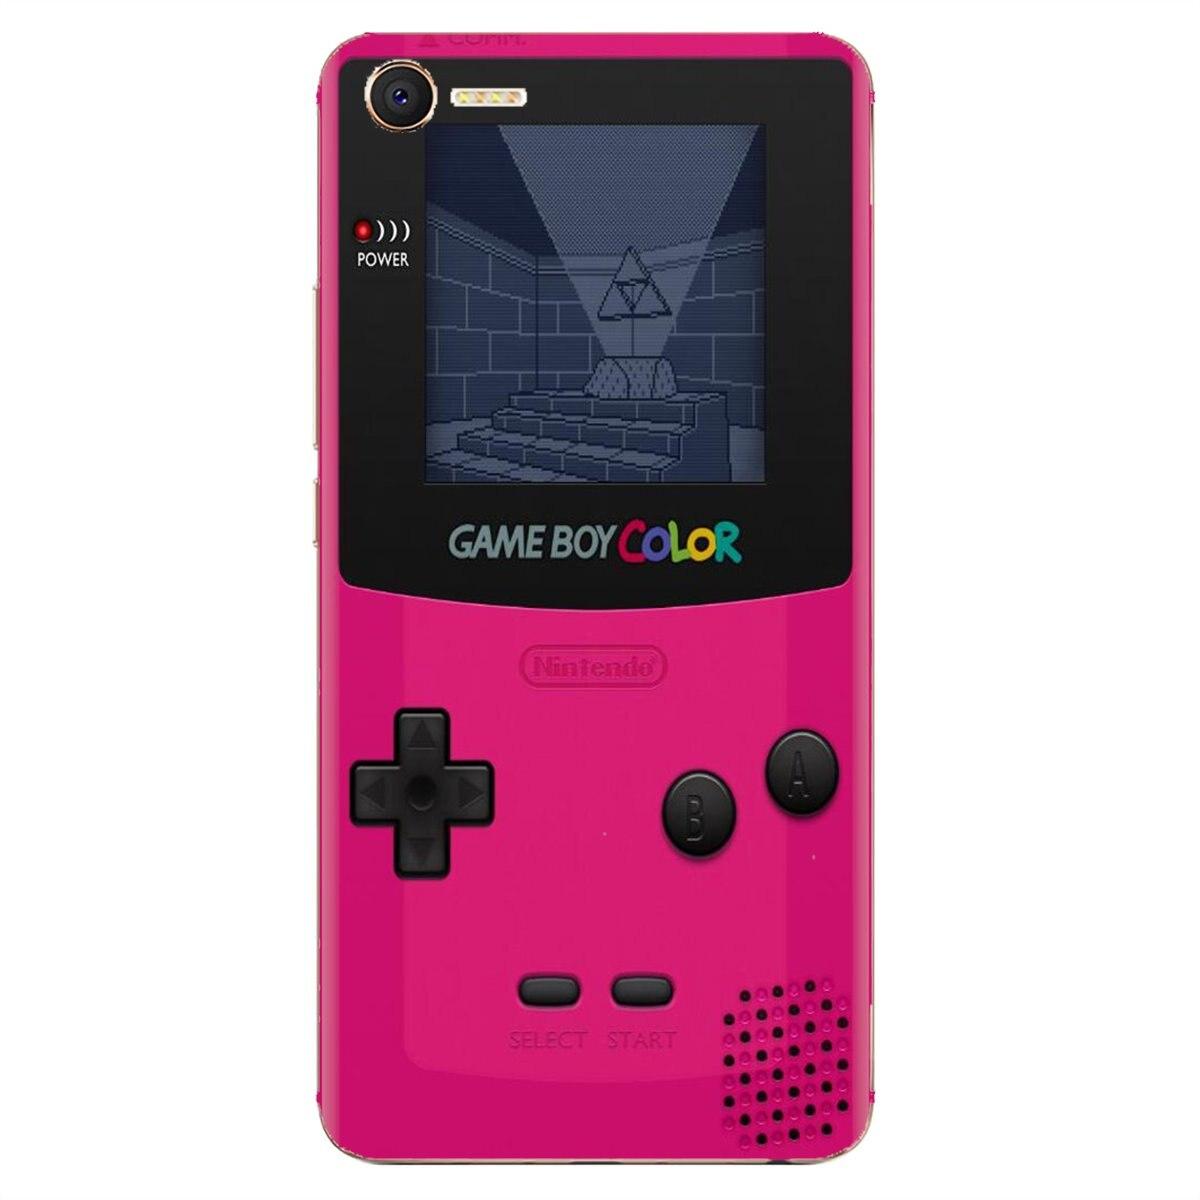 For Xiaomi Mi A1 A2 A3 5X 6X 8 9 9t Lite SE Pro Mi Max Mix 1 2 3 2S Fashion Silicone Phone Case cartoon Gameboy Boy PSP Game Box